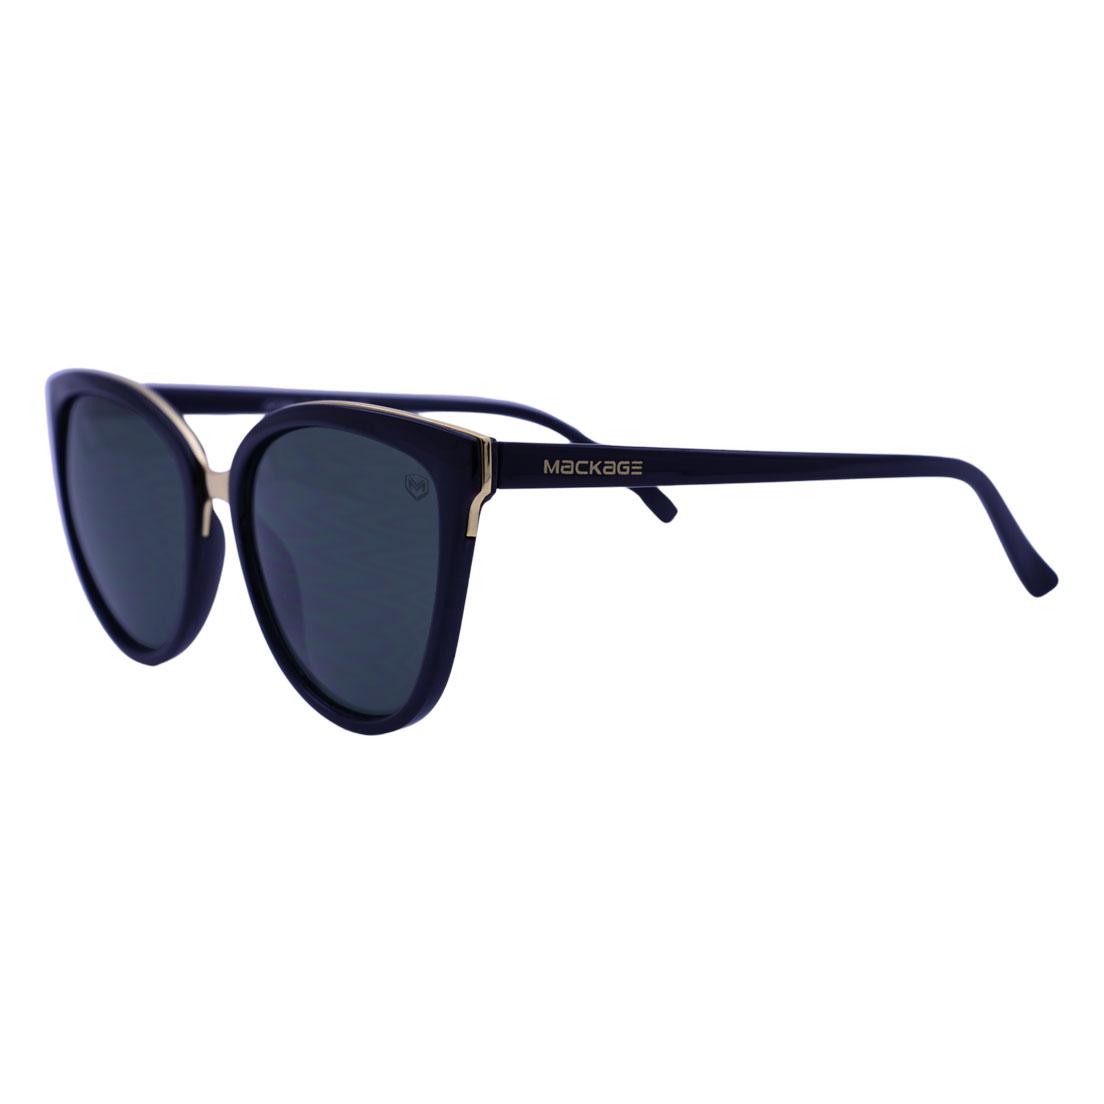 Óculos De Sol Mackage Feminino Acetato Oval Jack Feminino - Preto